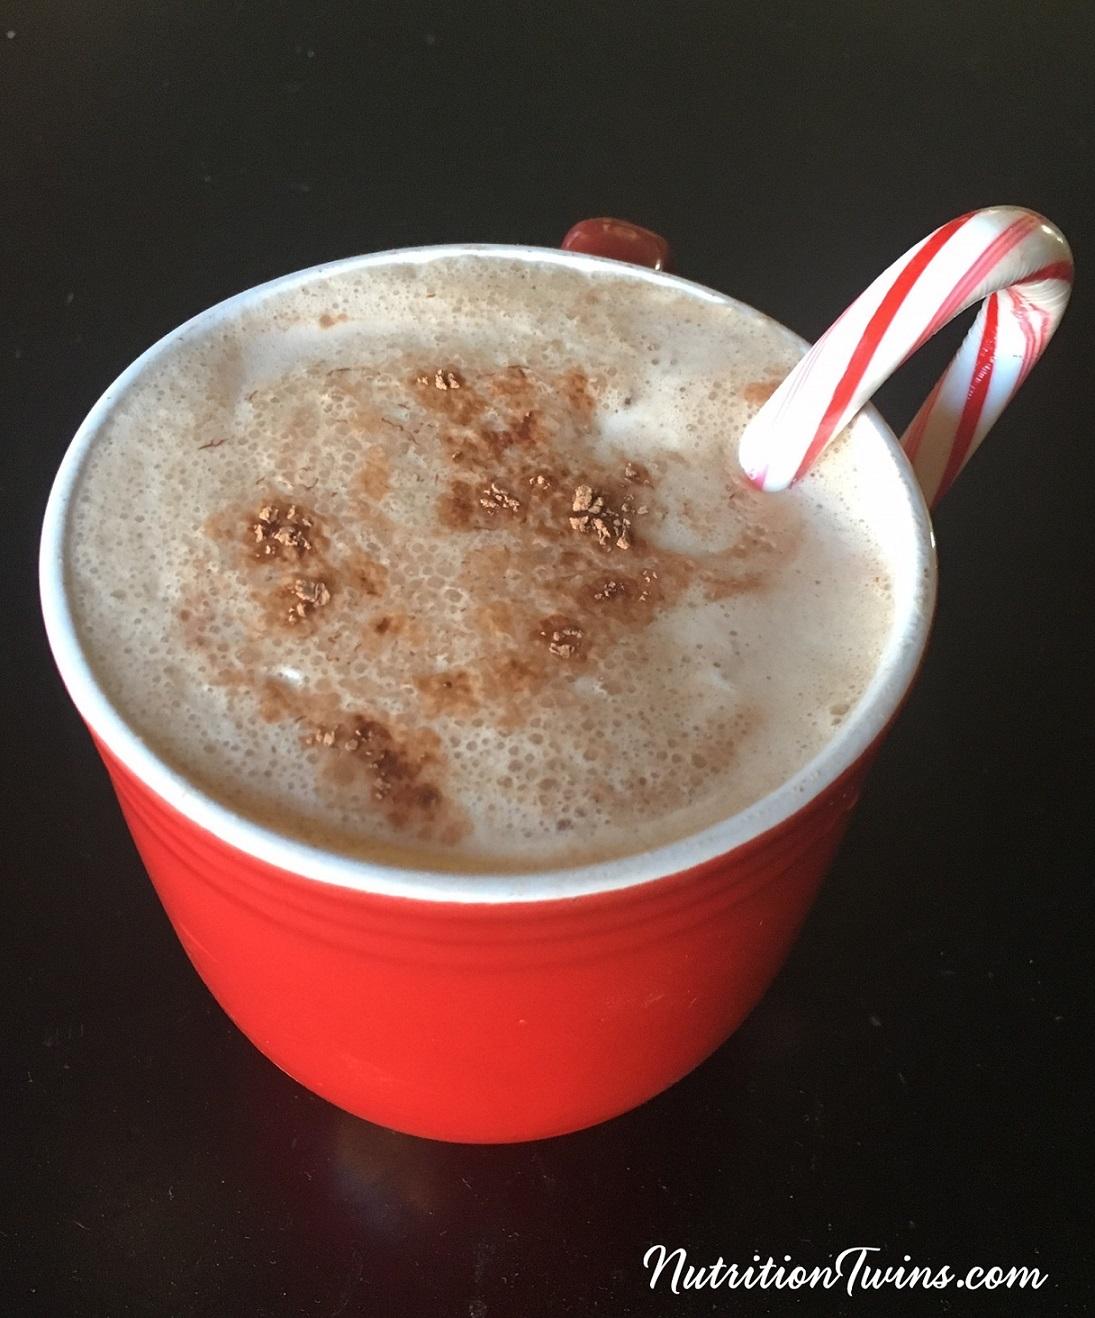 Skinny Peppermint Caffè Mocha LOGO